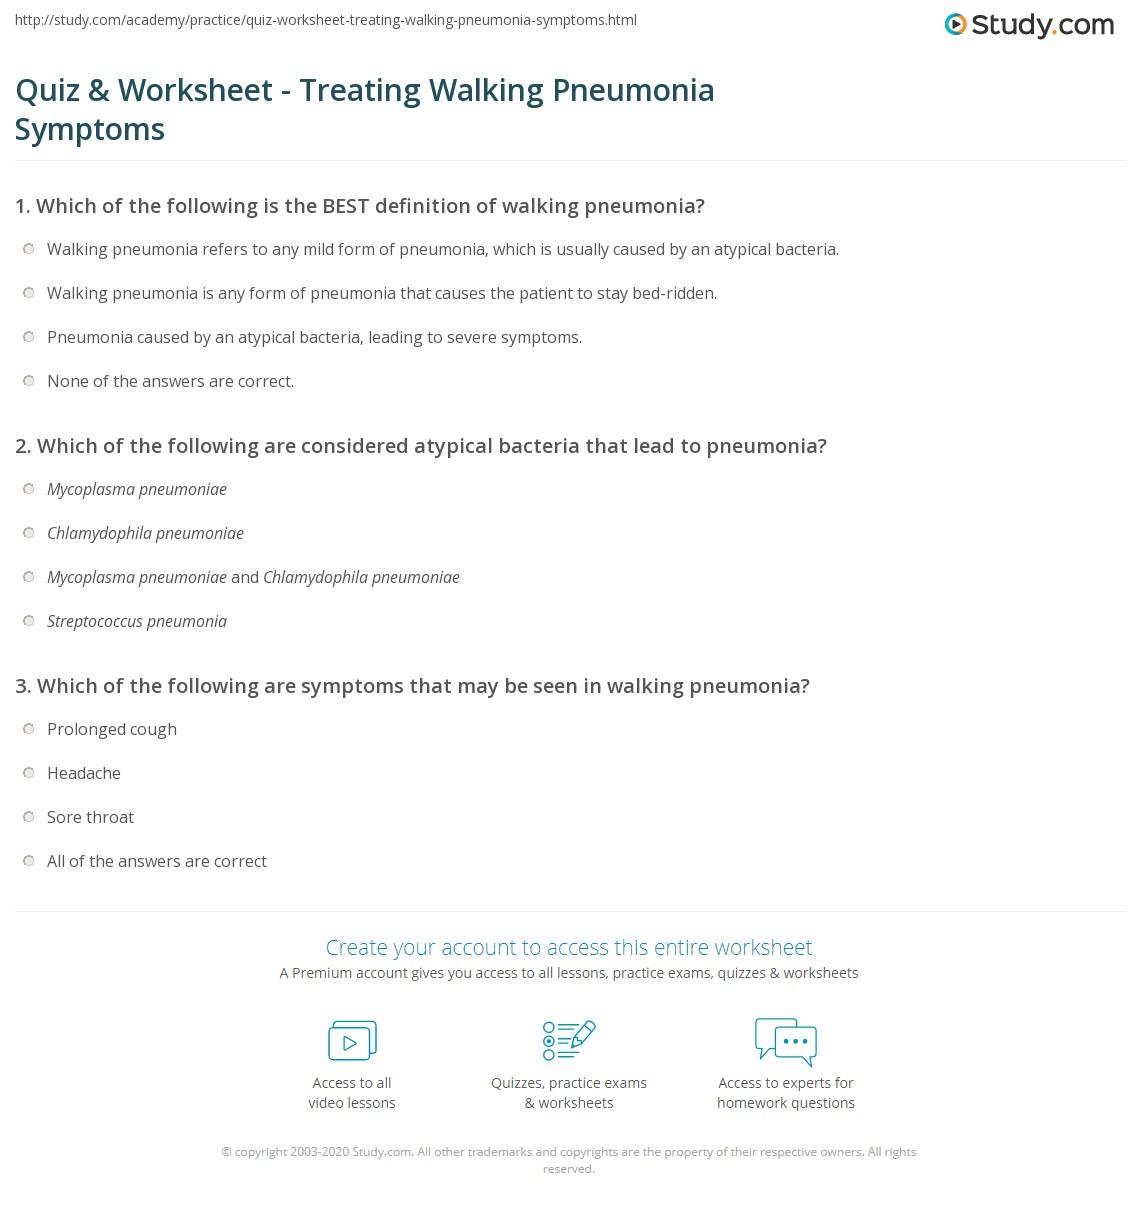 quiz & worksheet - treating walking pneumonia symptoms | study, Cephalic Vein